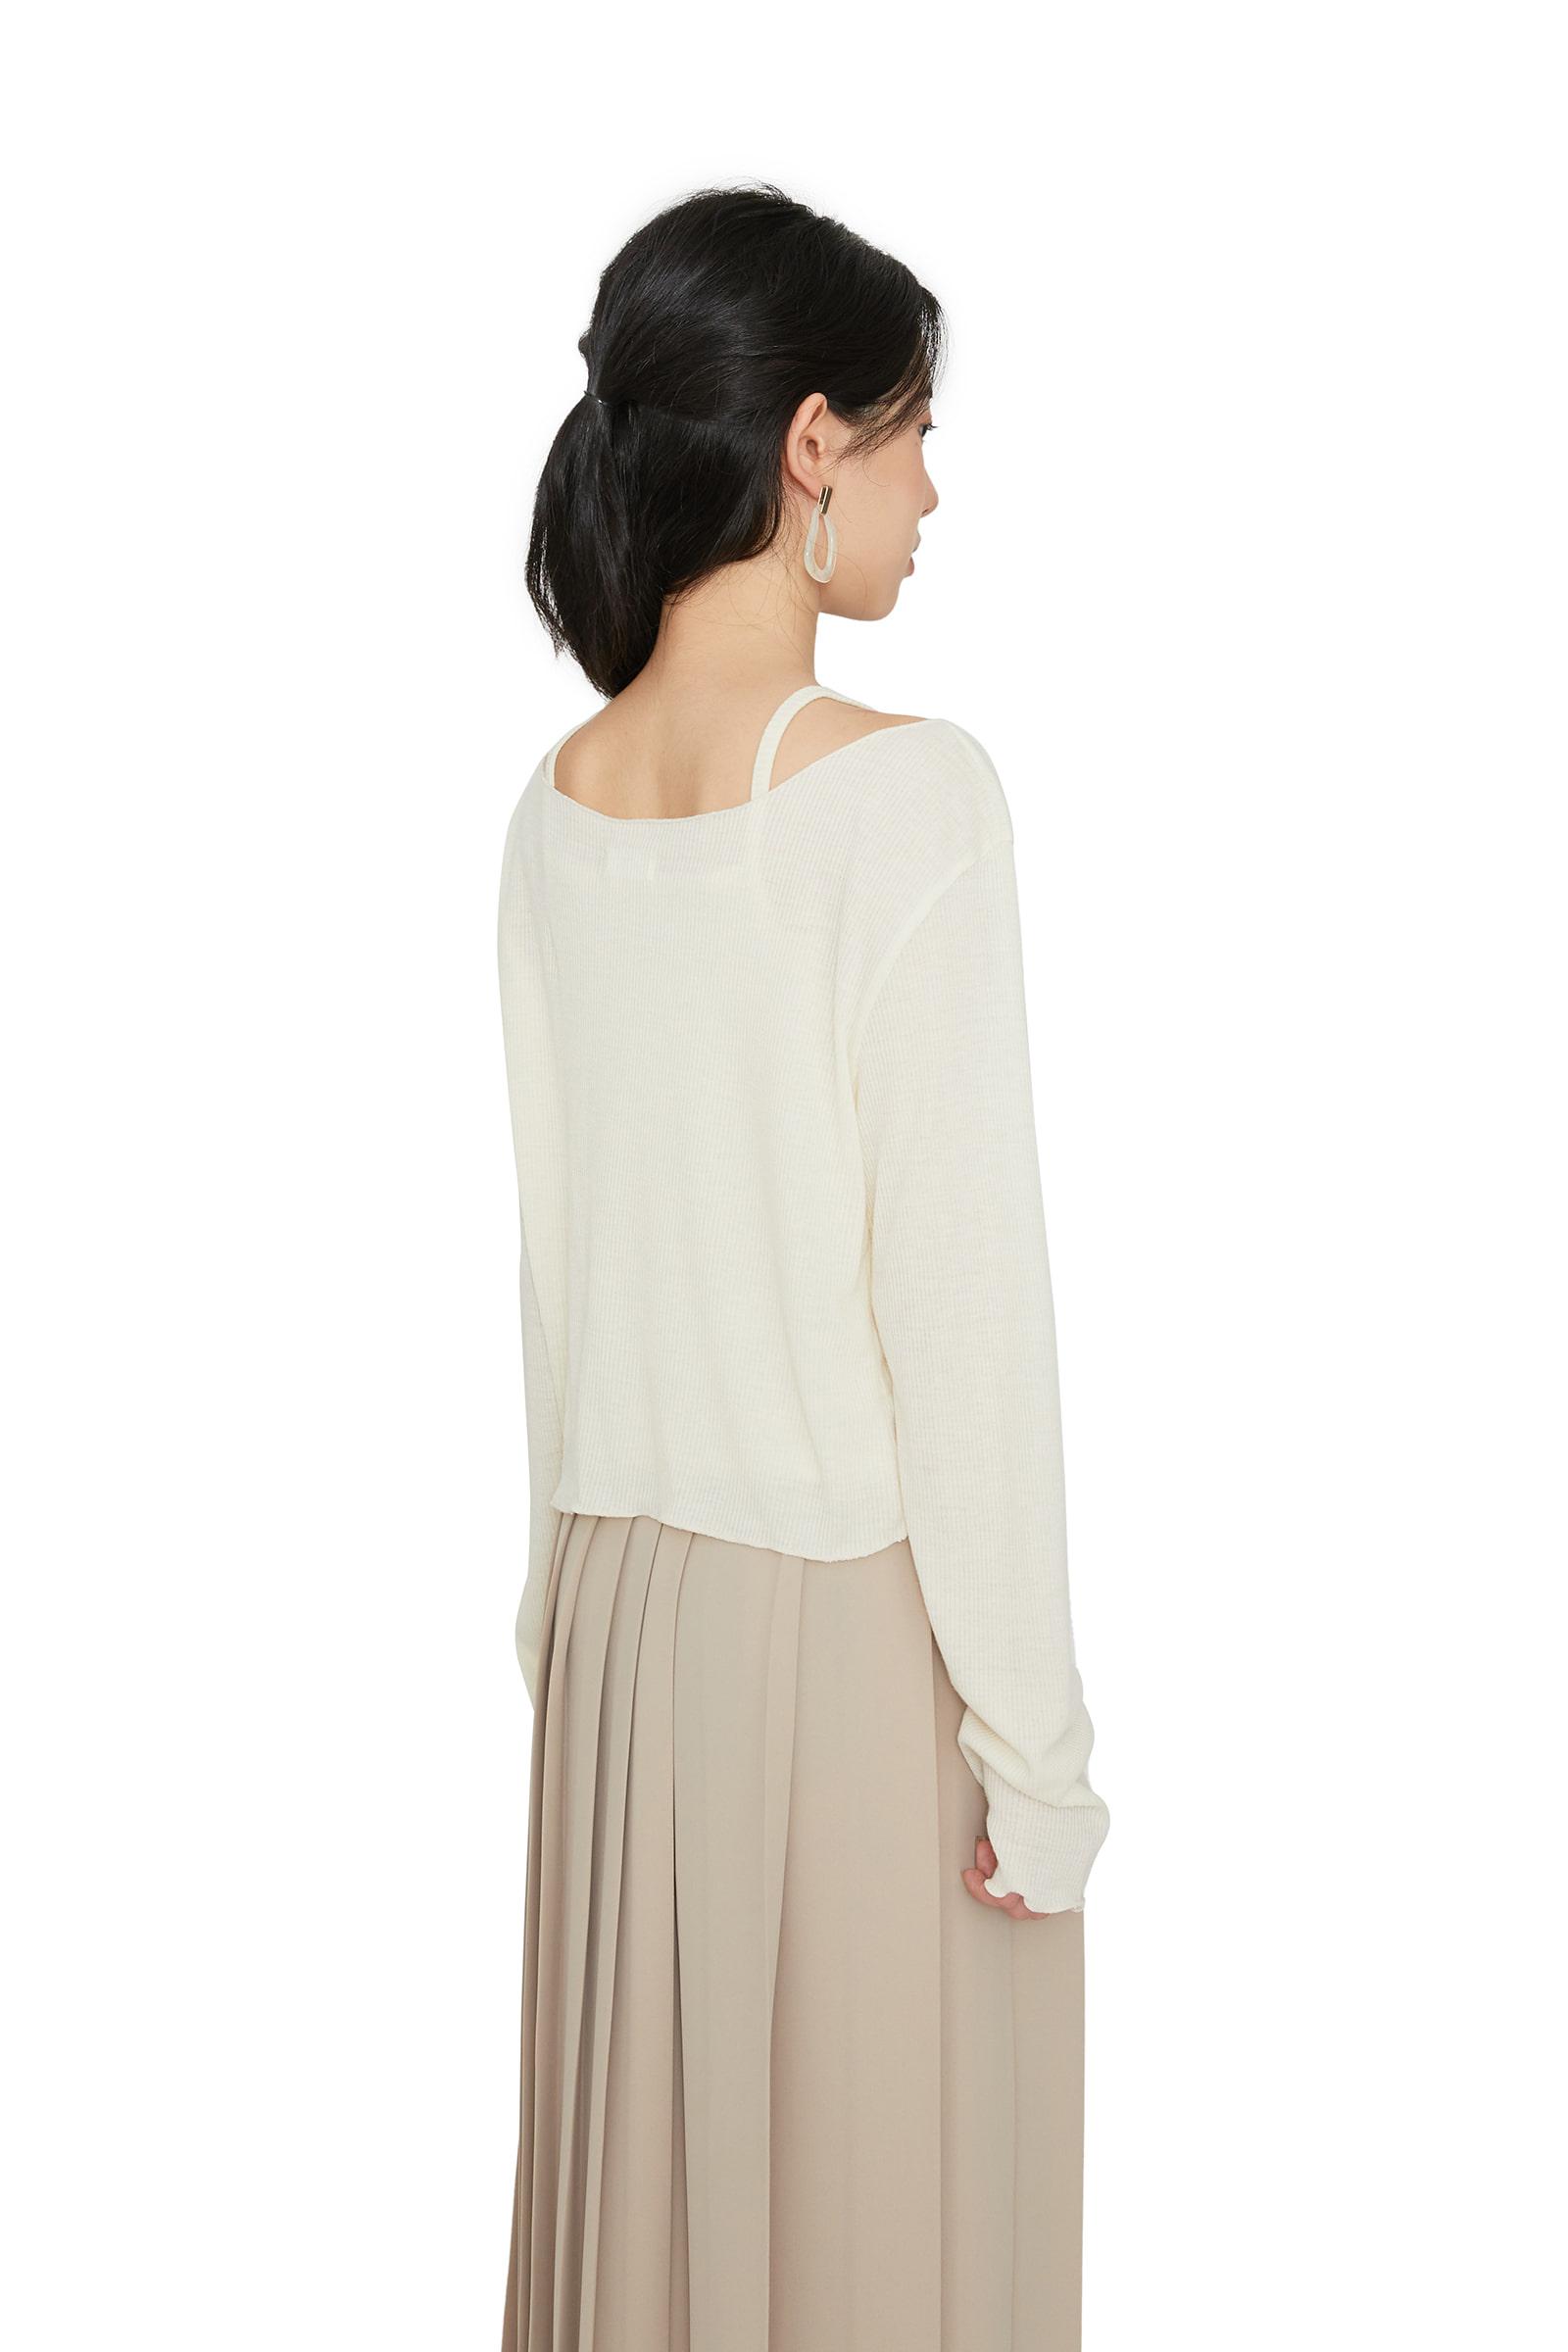 Shy twist sleeveless set top